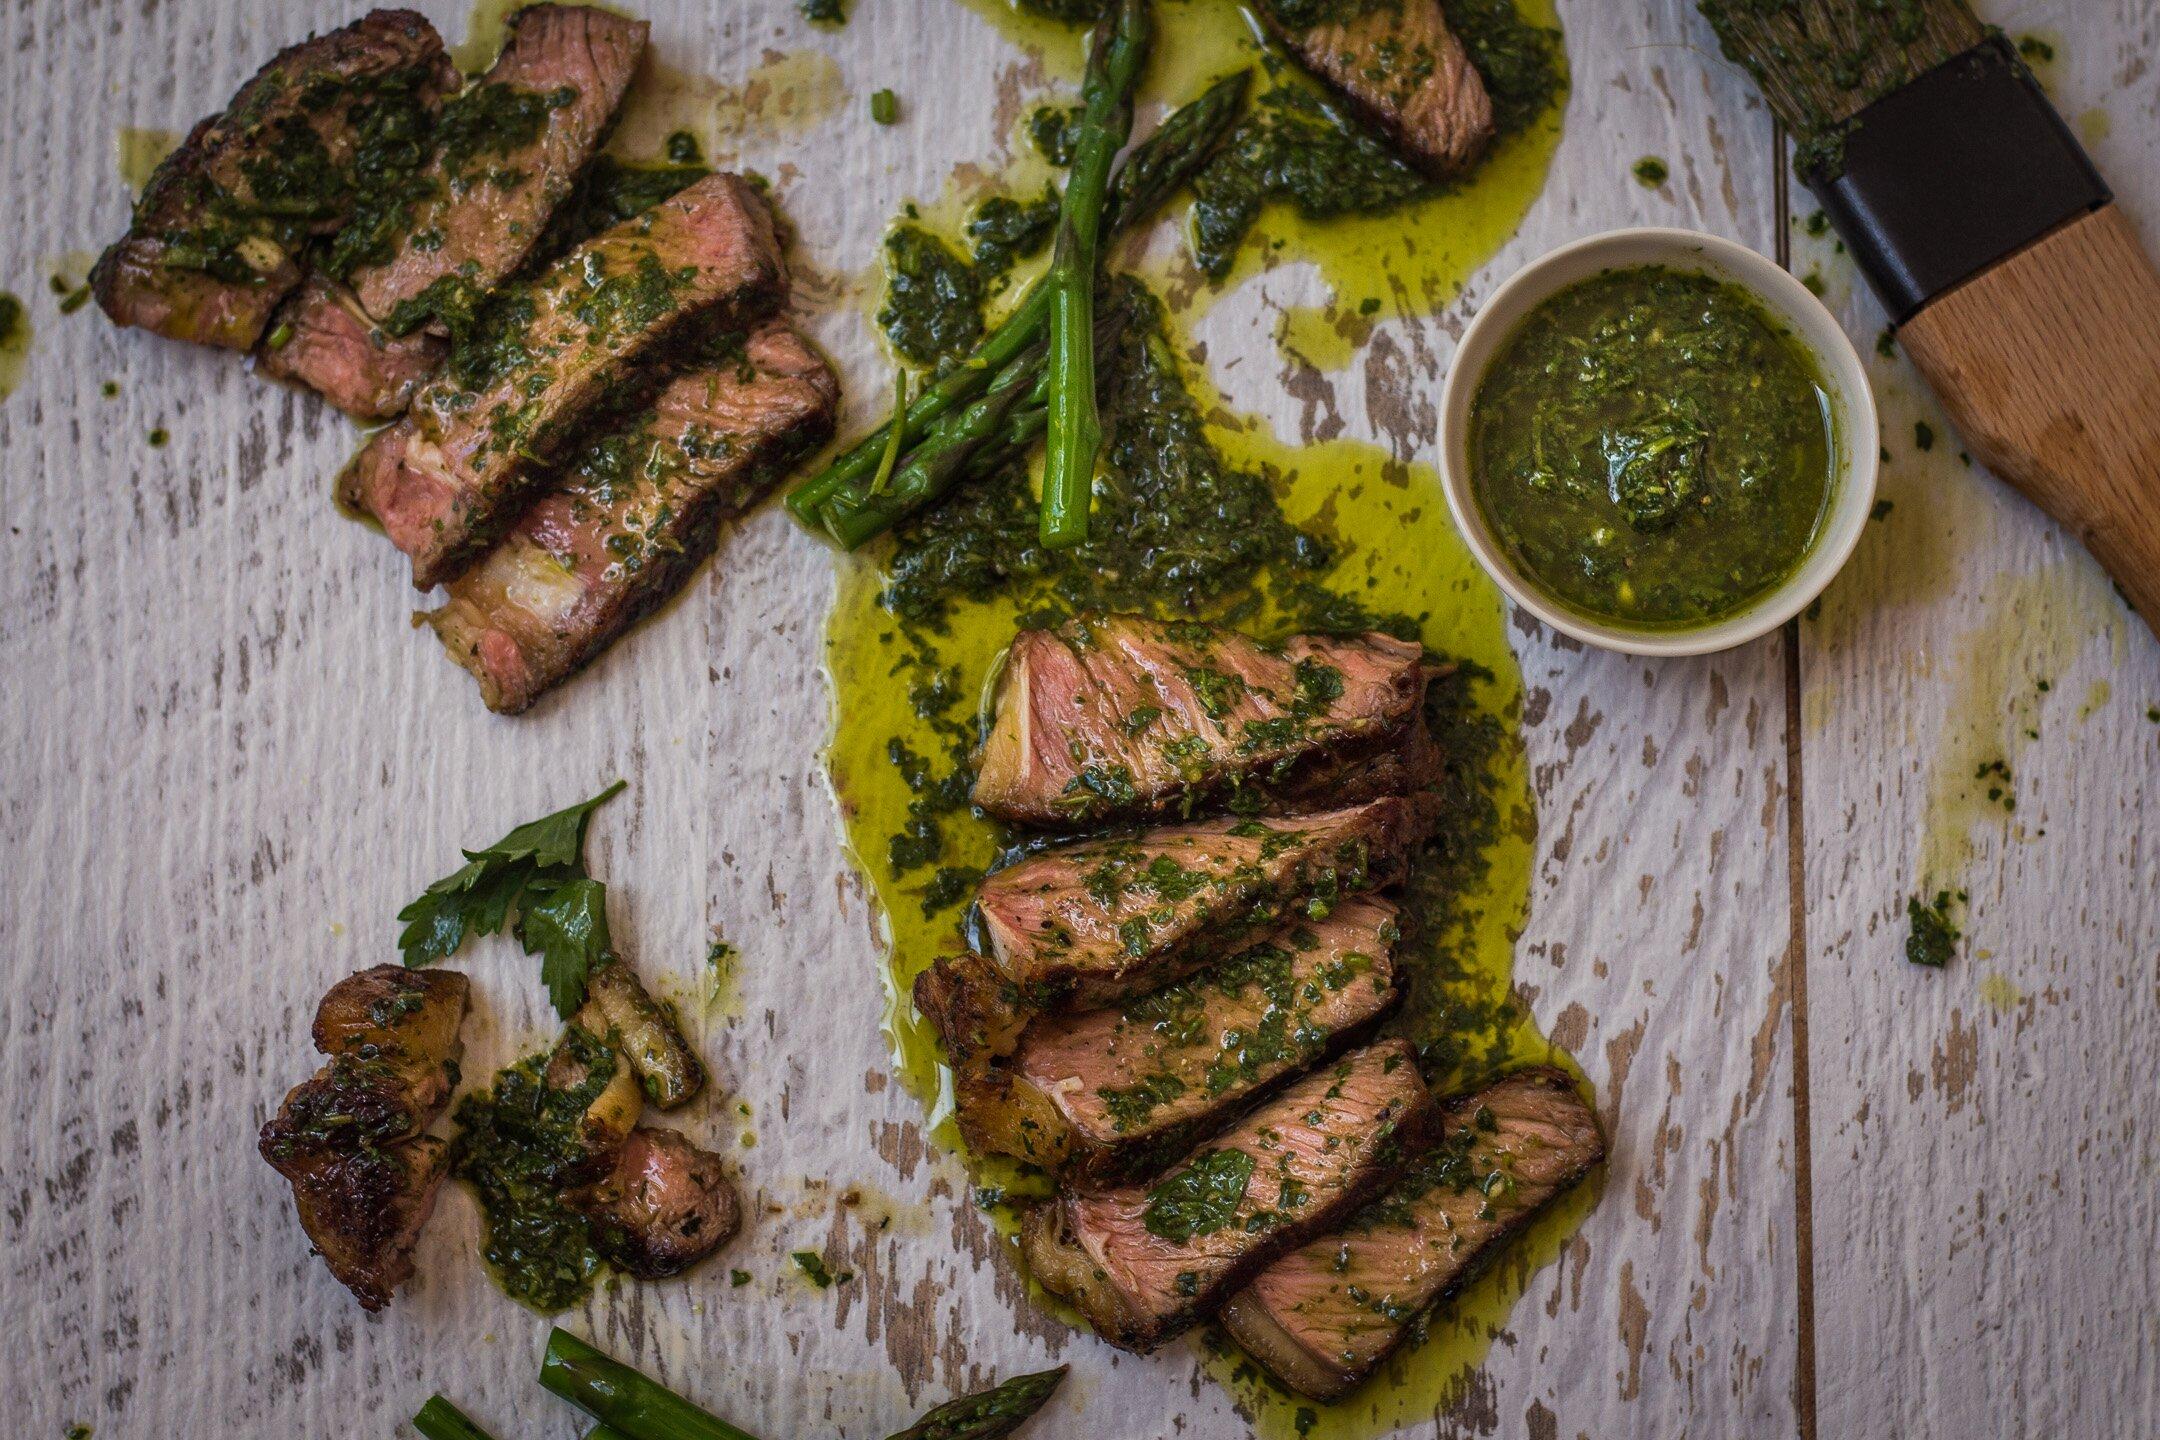 steak-with-chimichurri-sauce-recipe-4